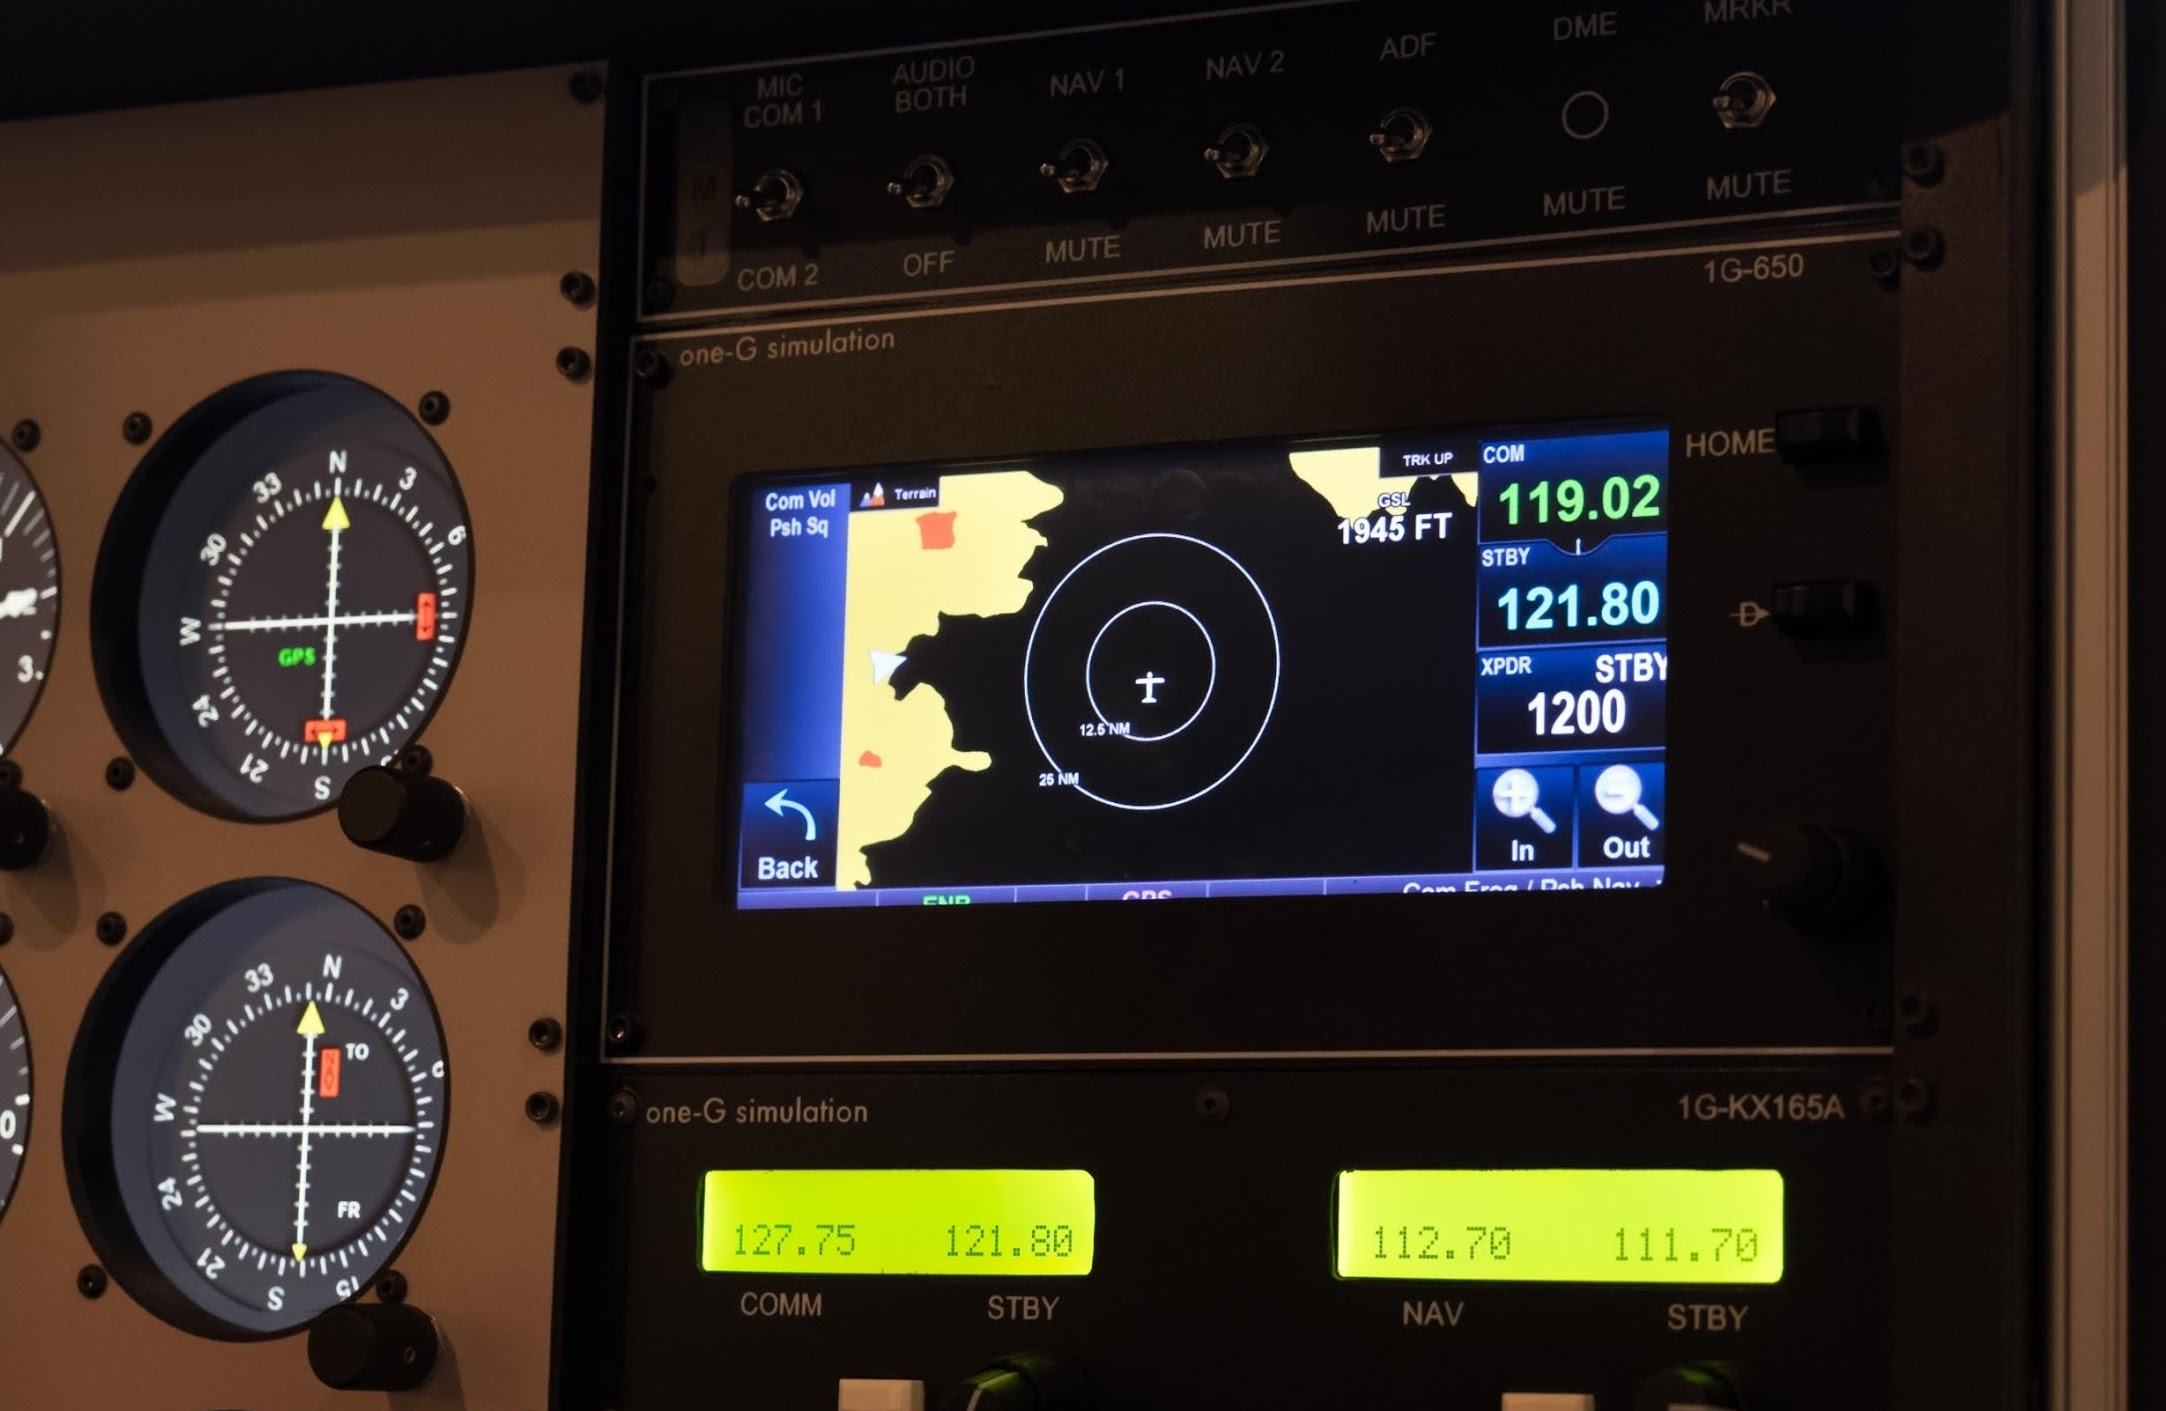 Navigation - 1G-650Faithful emulator of the Garmin GTN 650.Learn More ‣1G-430Faithful emulator of the popular Garmin 4301G-750Faithful emulator of the Garmin GTN 750.